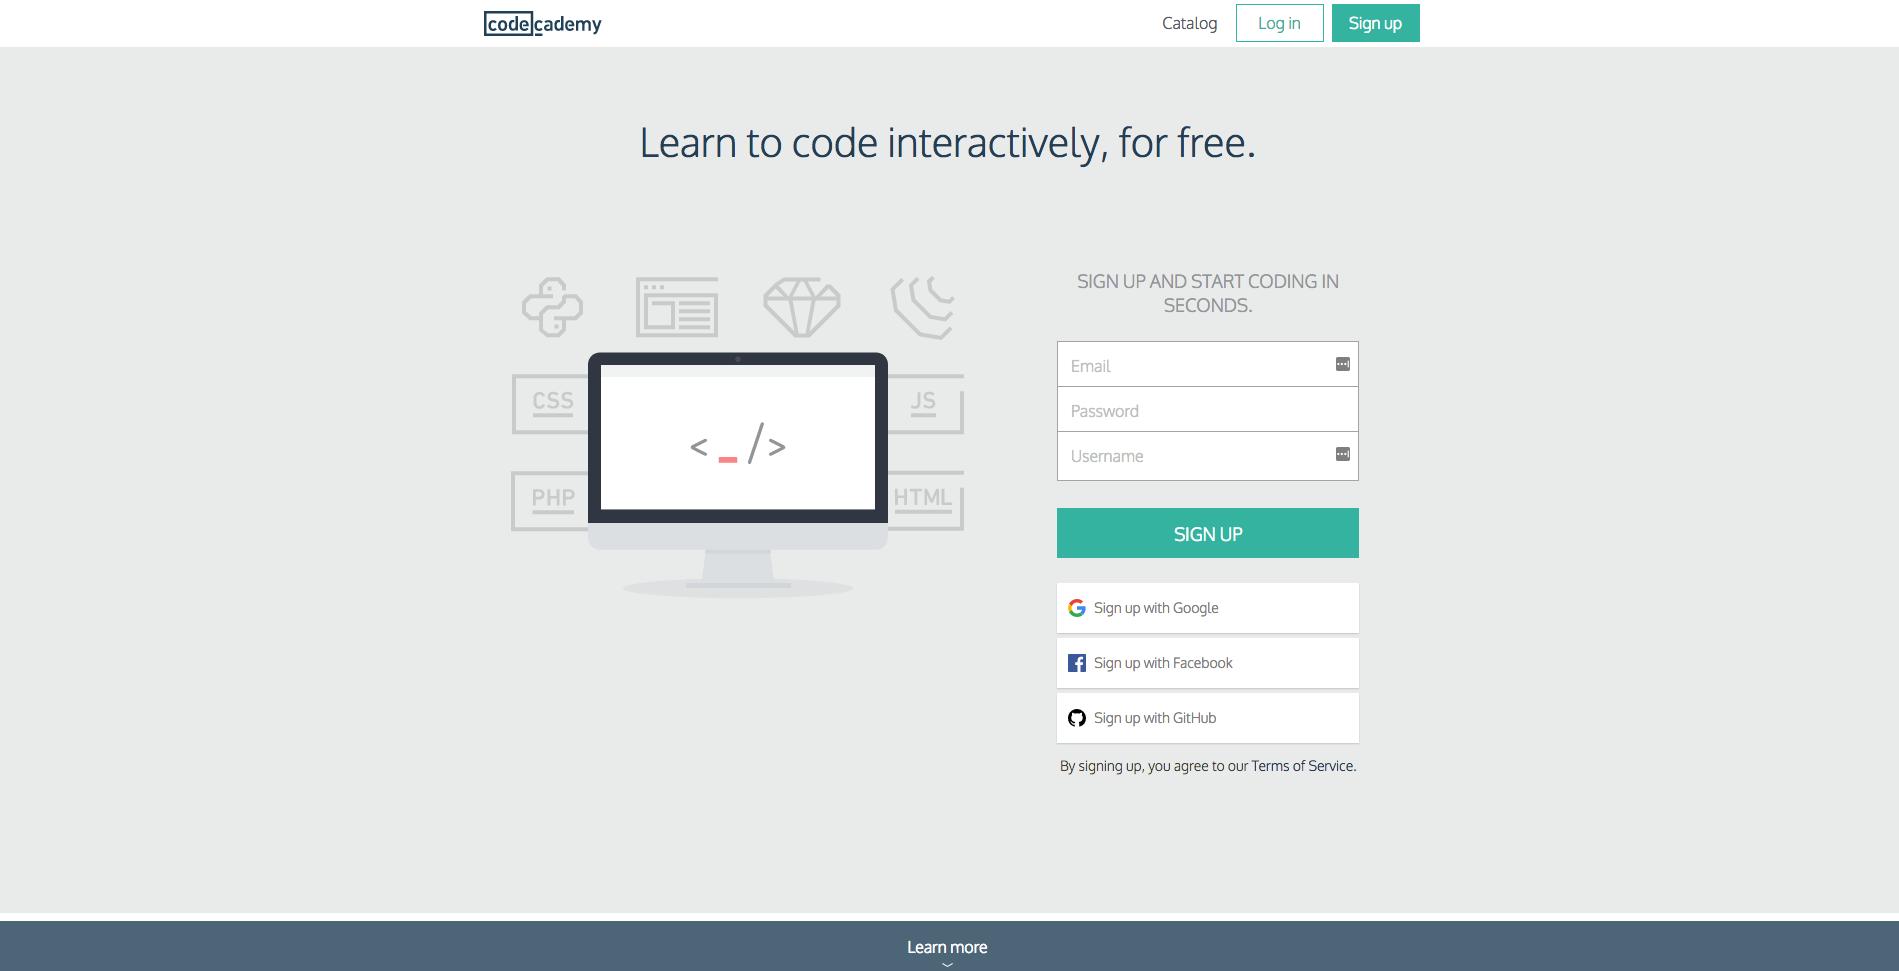 Online graphic design and web development education